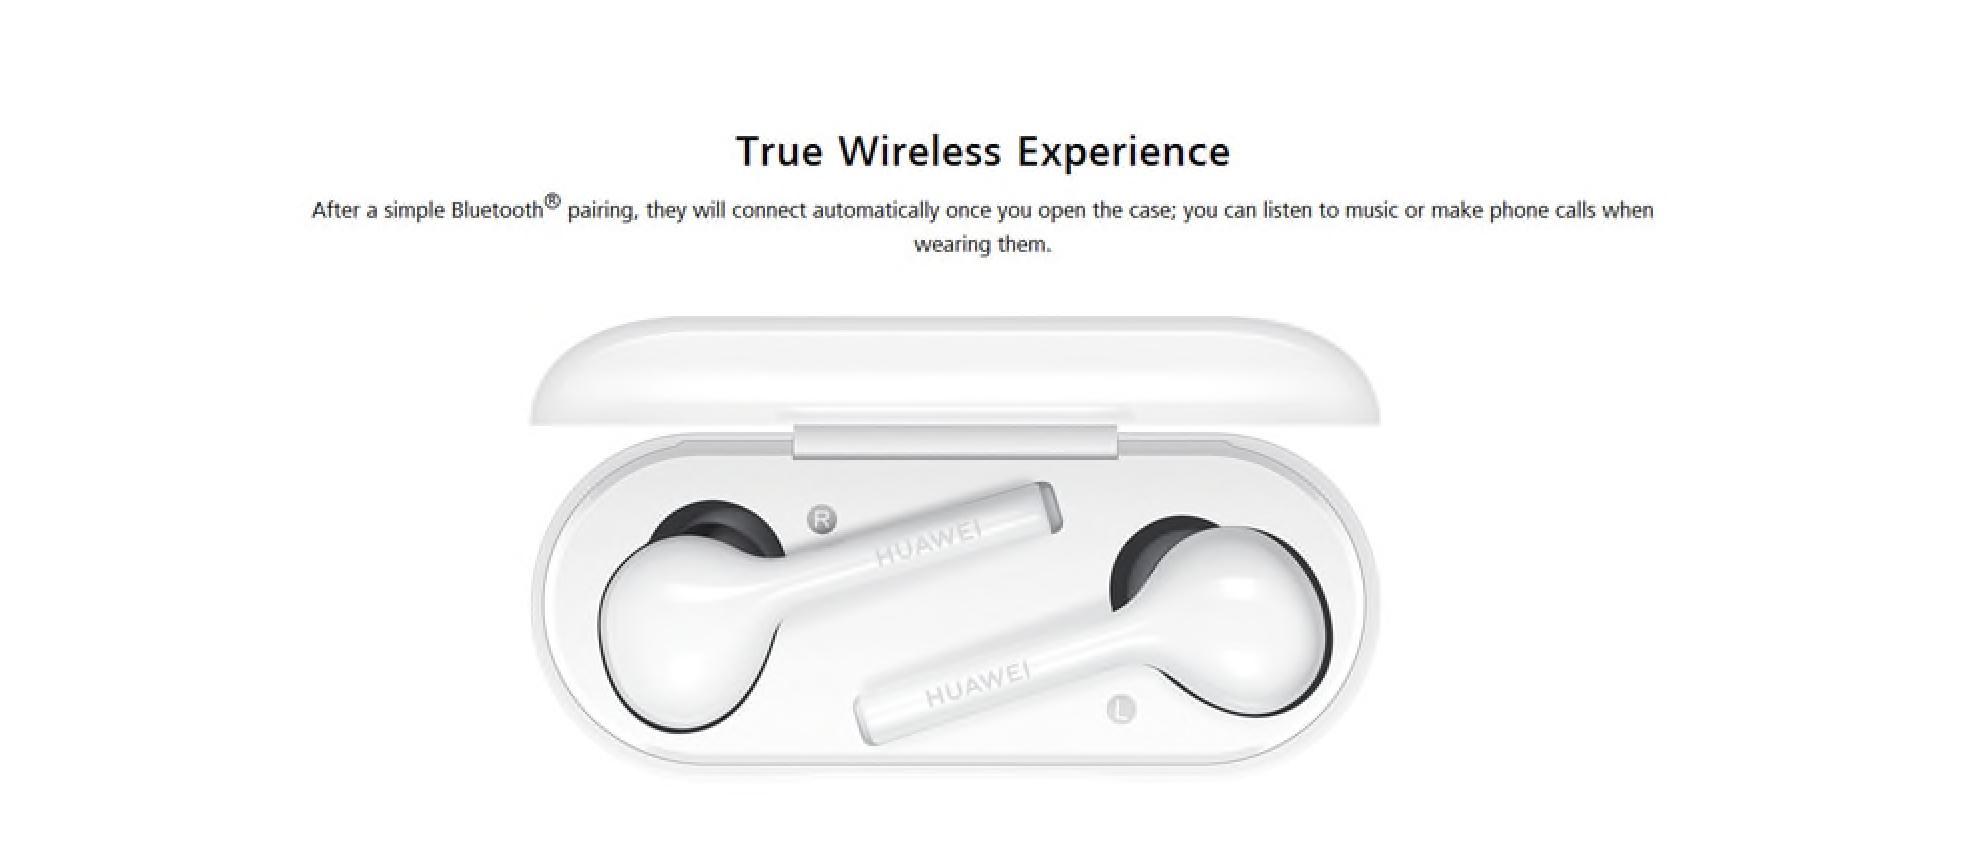 Bezdrátová sluchátka Huawei FlyPods a limitovaná sleva! [sponzorovaný článek]